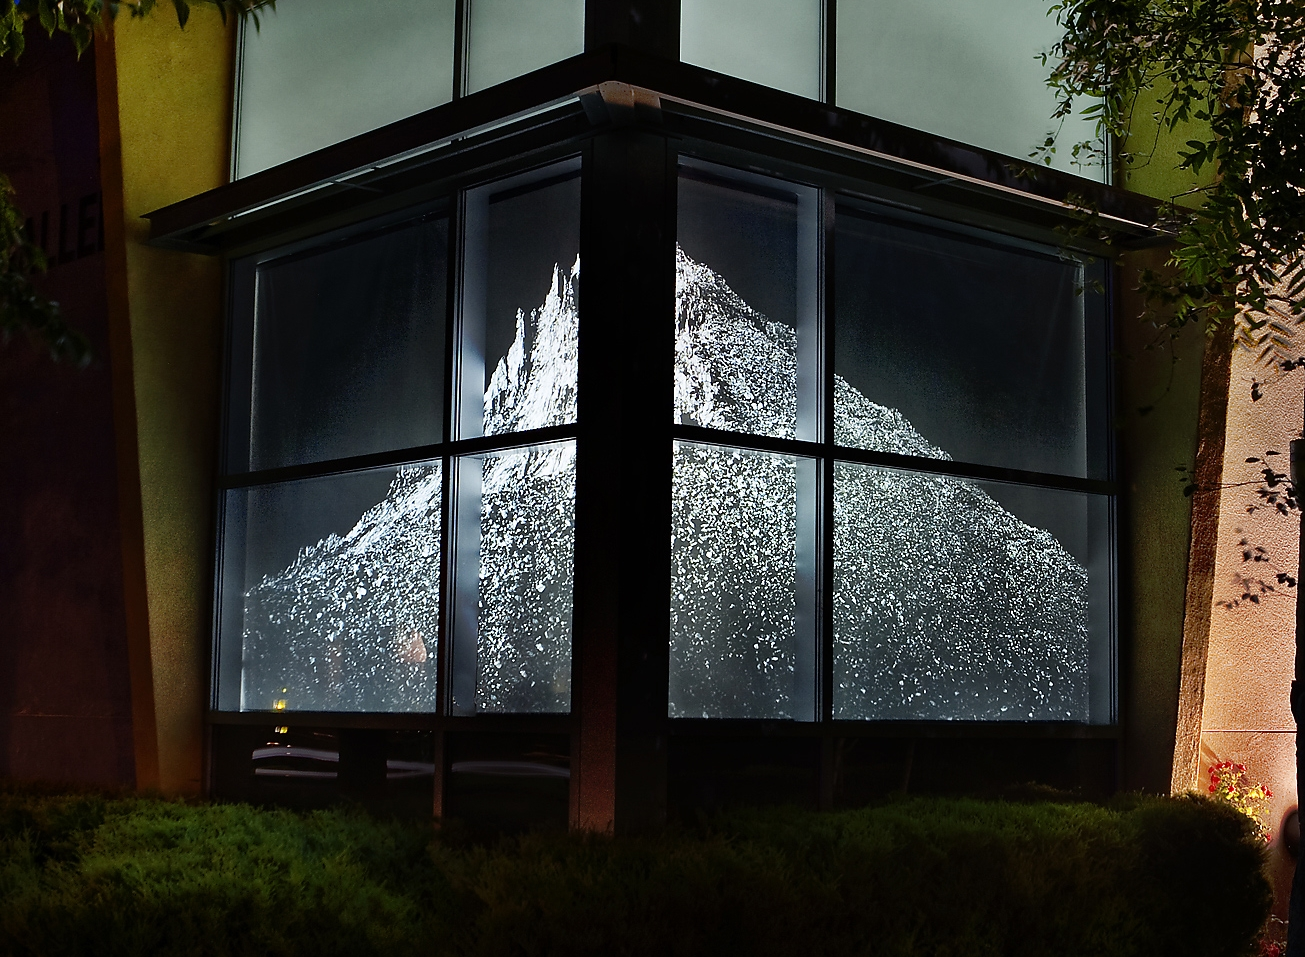 blackout-printed-window-shade.jpg